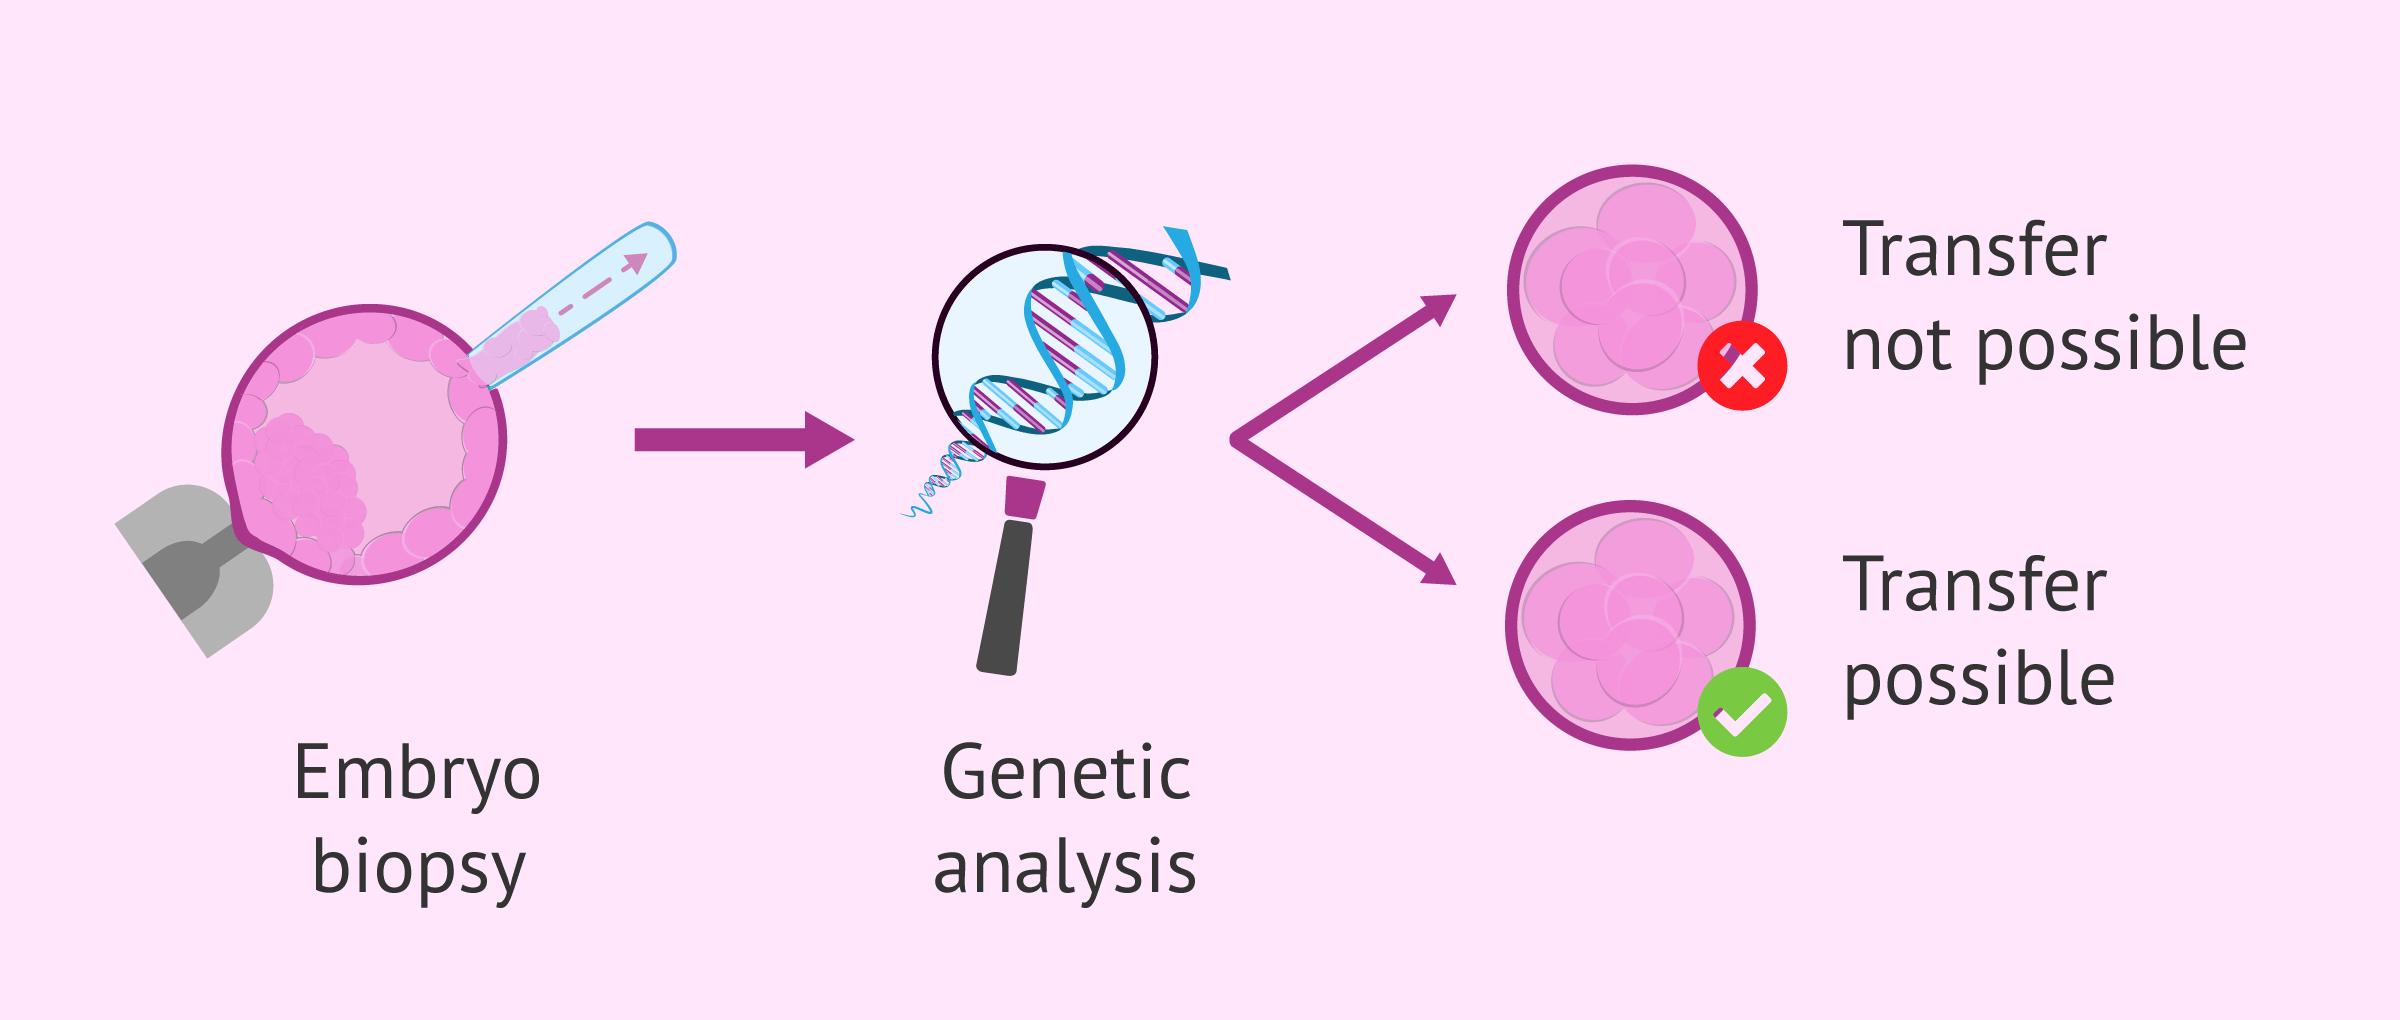 genetic-analysis-embryo-transfer